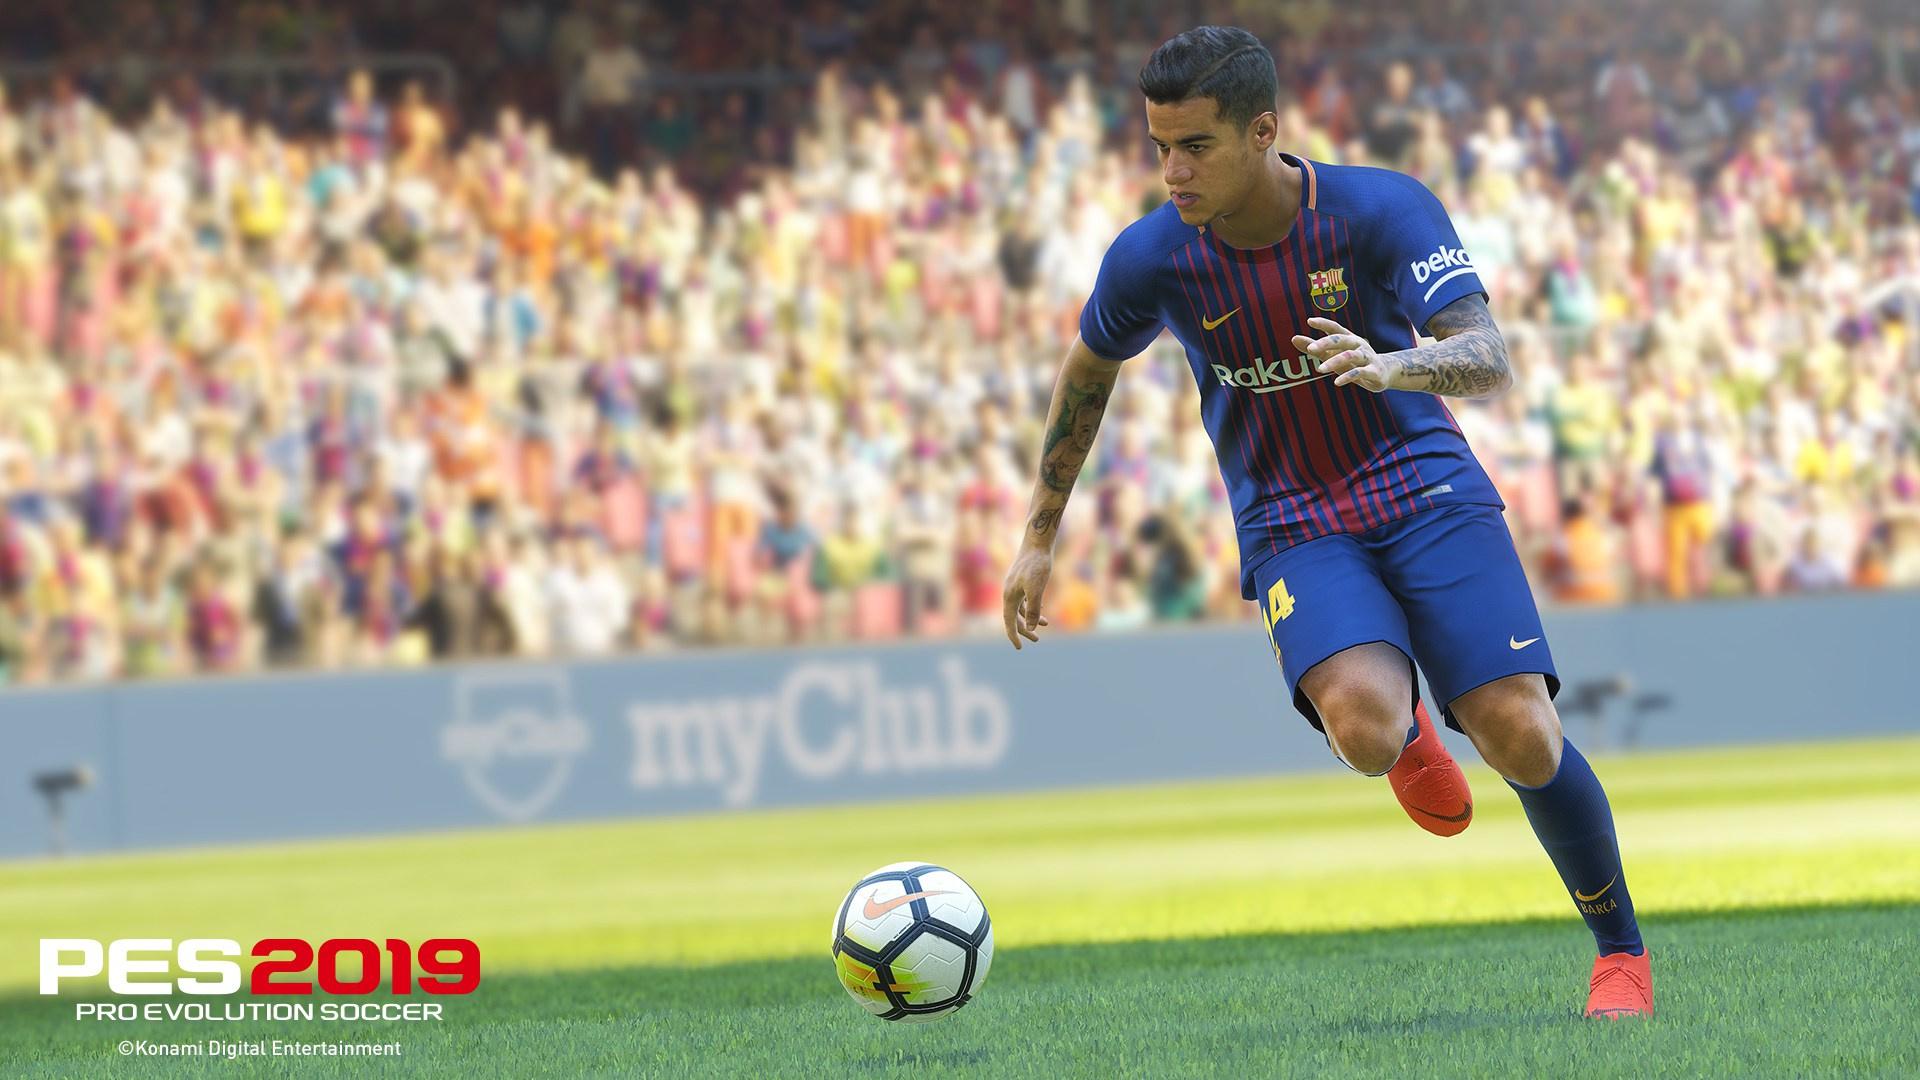 PES 2019: Pro Evolution Soccer Review (PS4) | Push Square